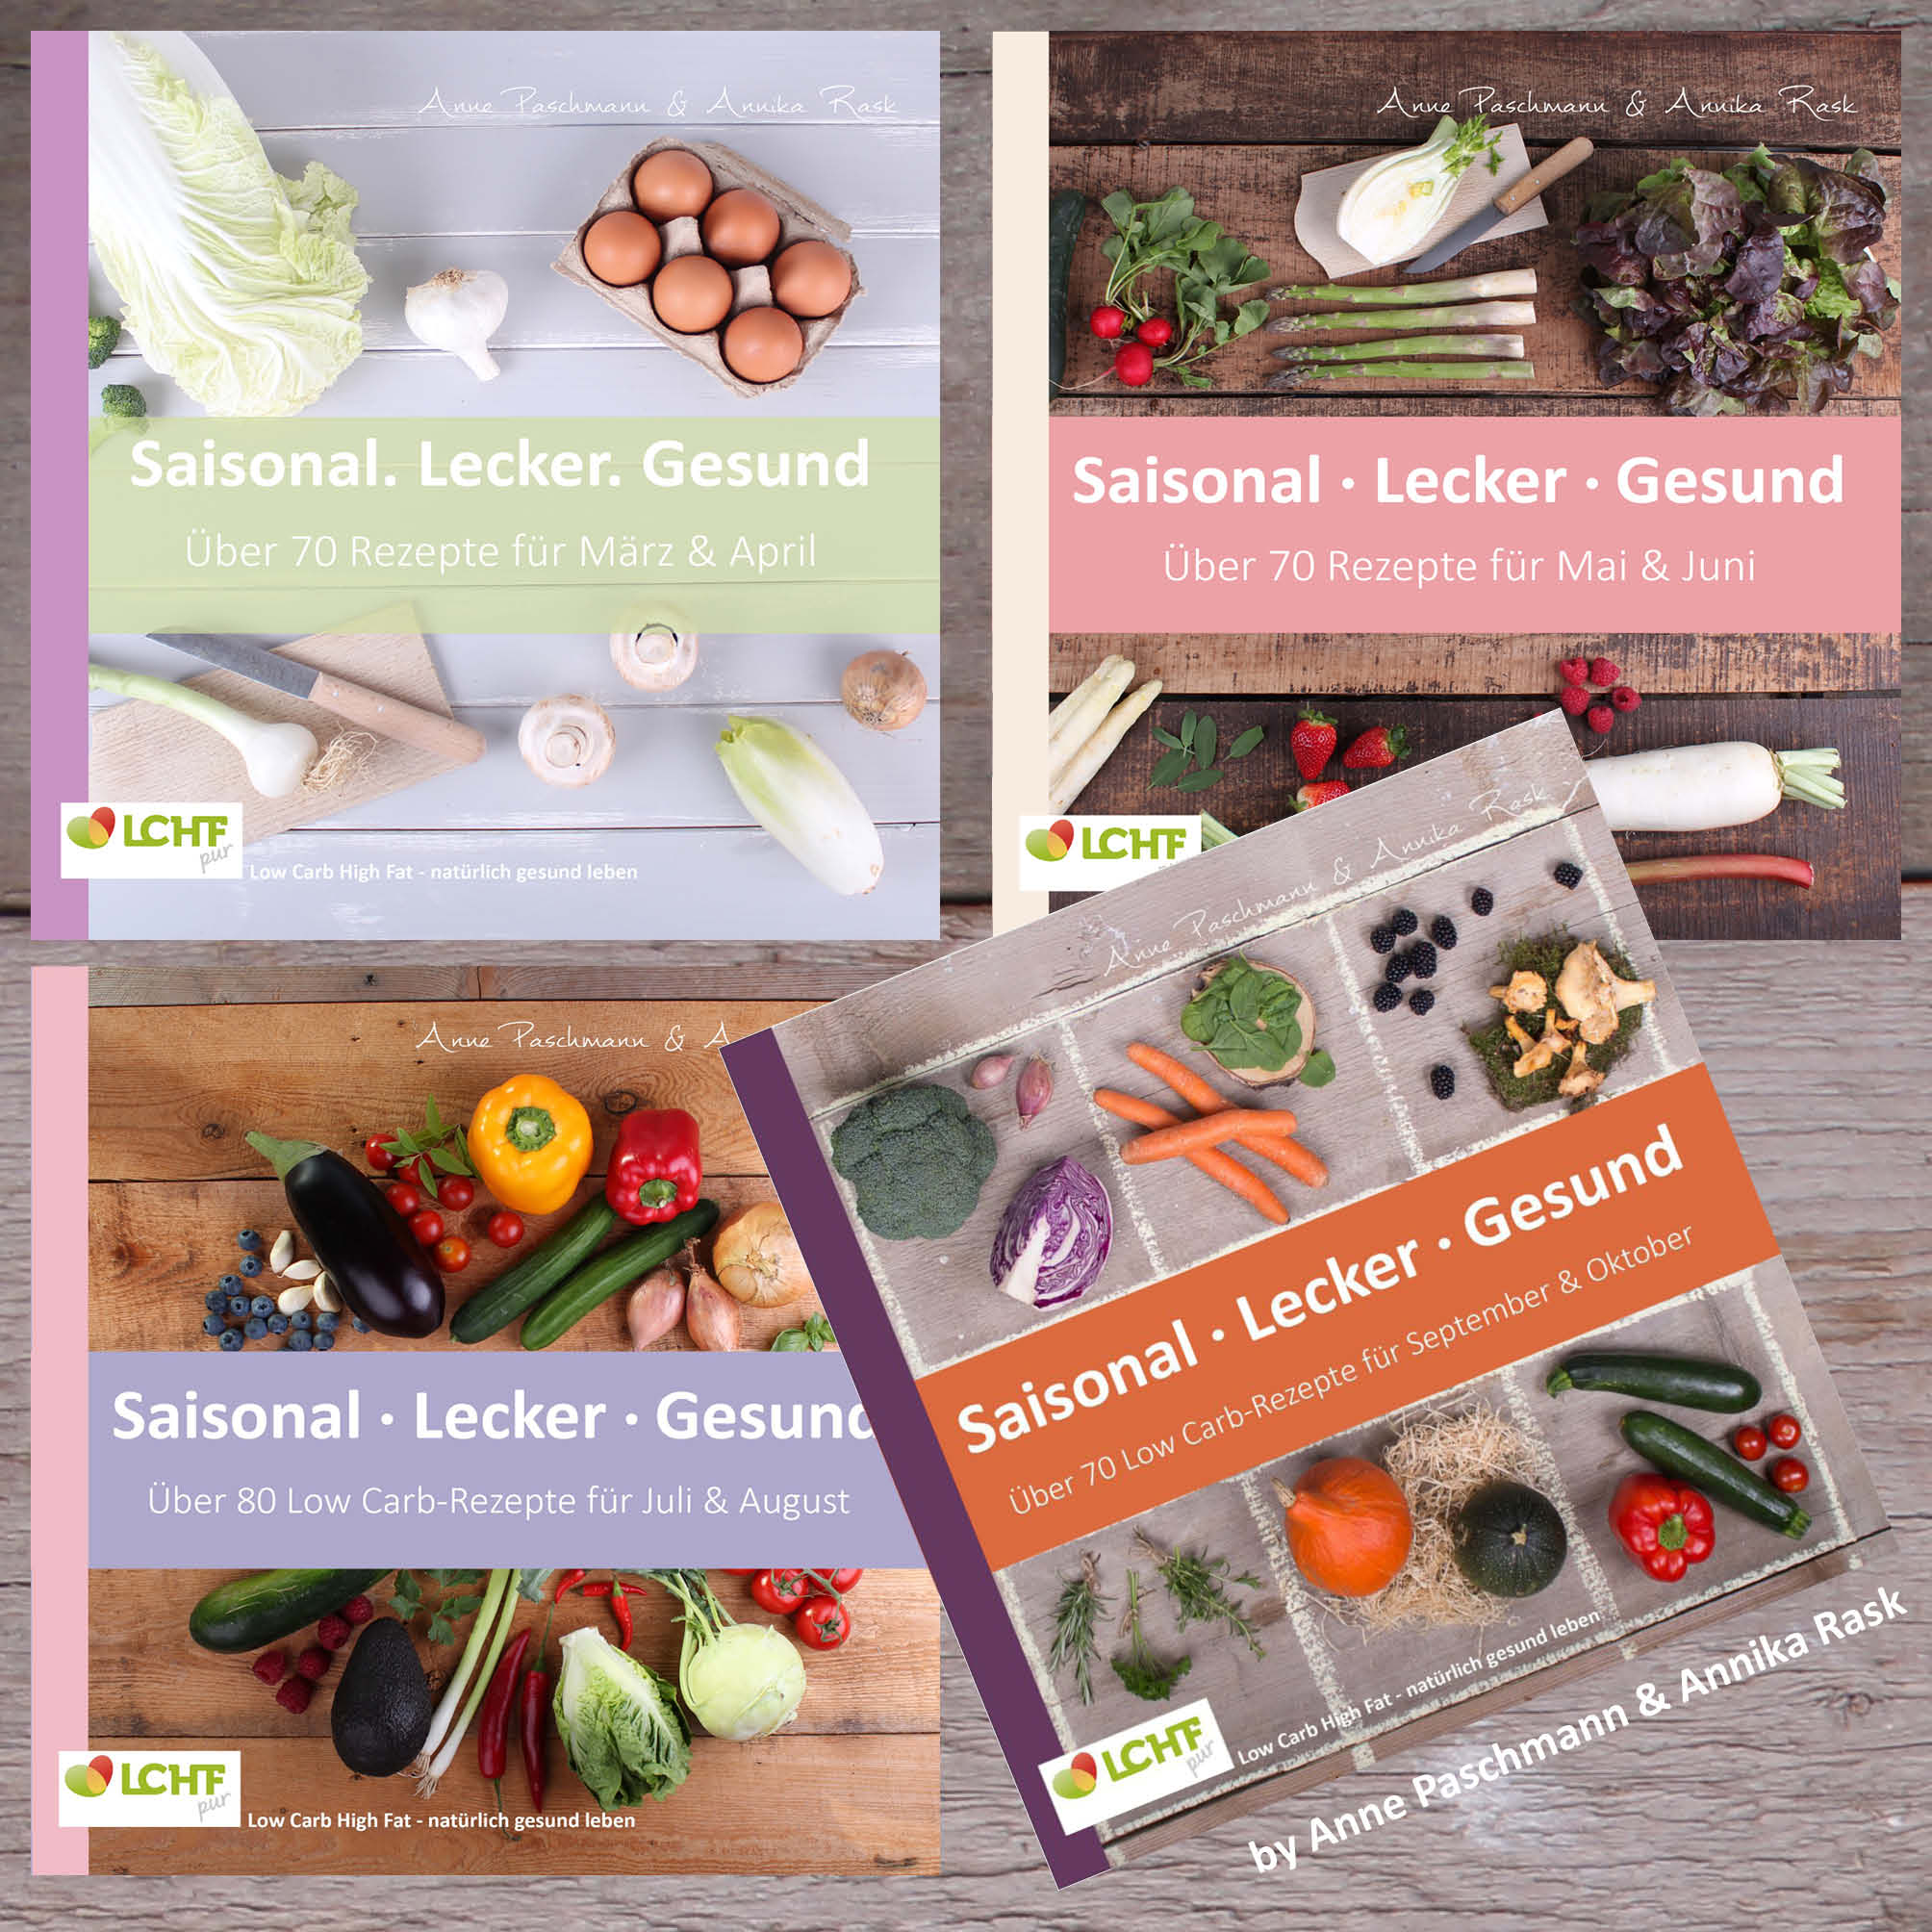 4 Cover der Kochbuchserie Saisonal. Lecker. Gesund